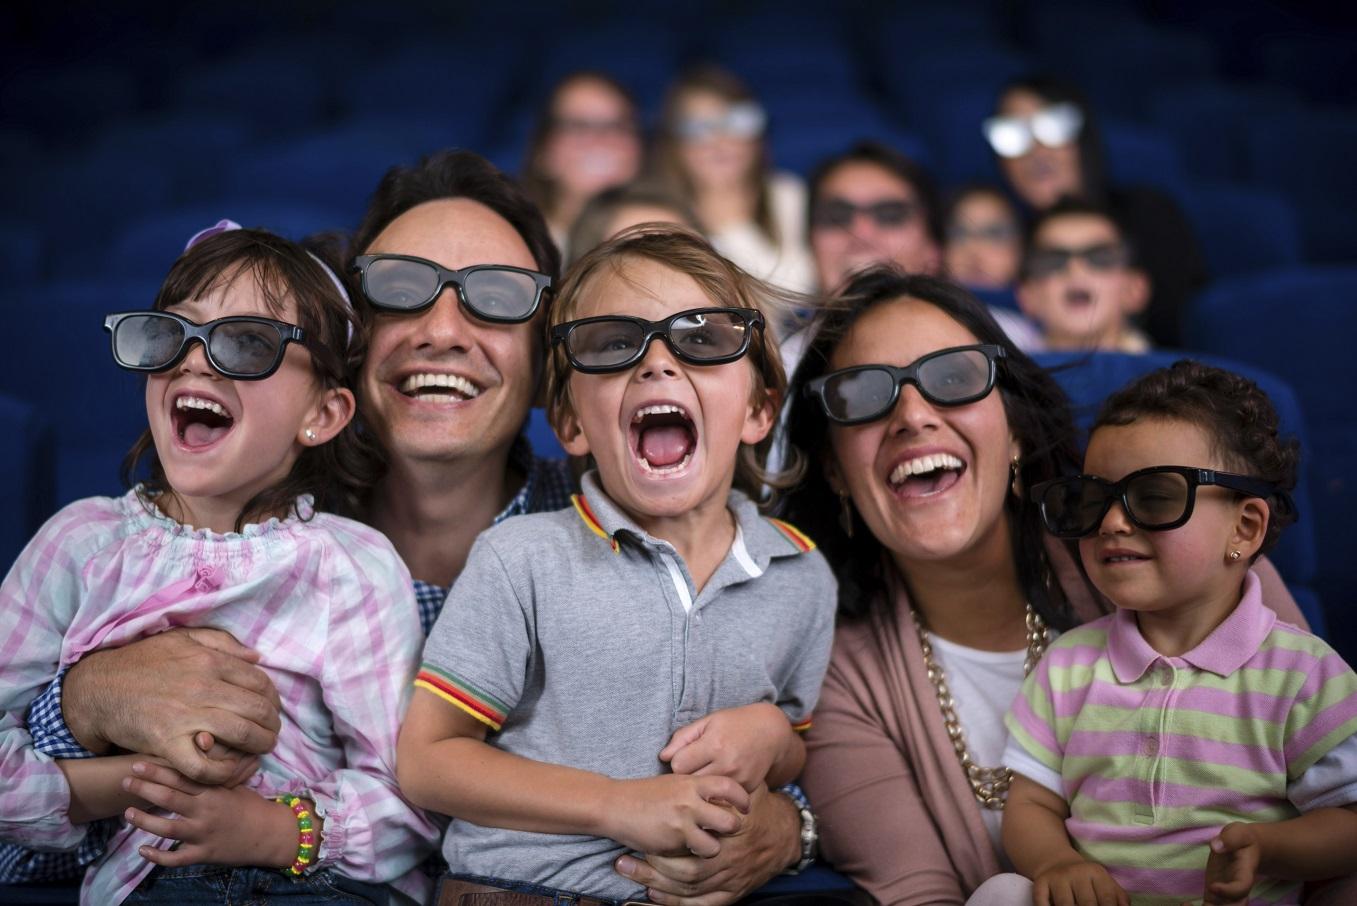 Photo of ريل سينما تقدم عروض الأفلام الصباحية للأطفال طوال شهر أغسطس